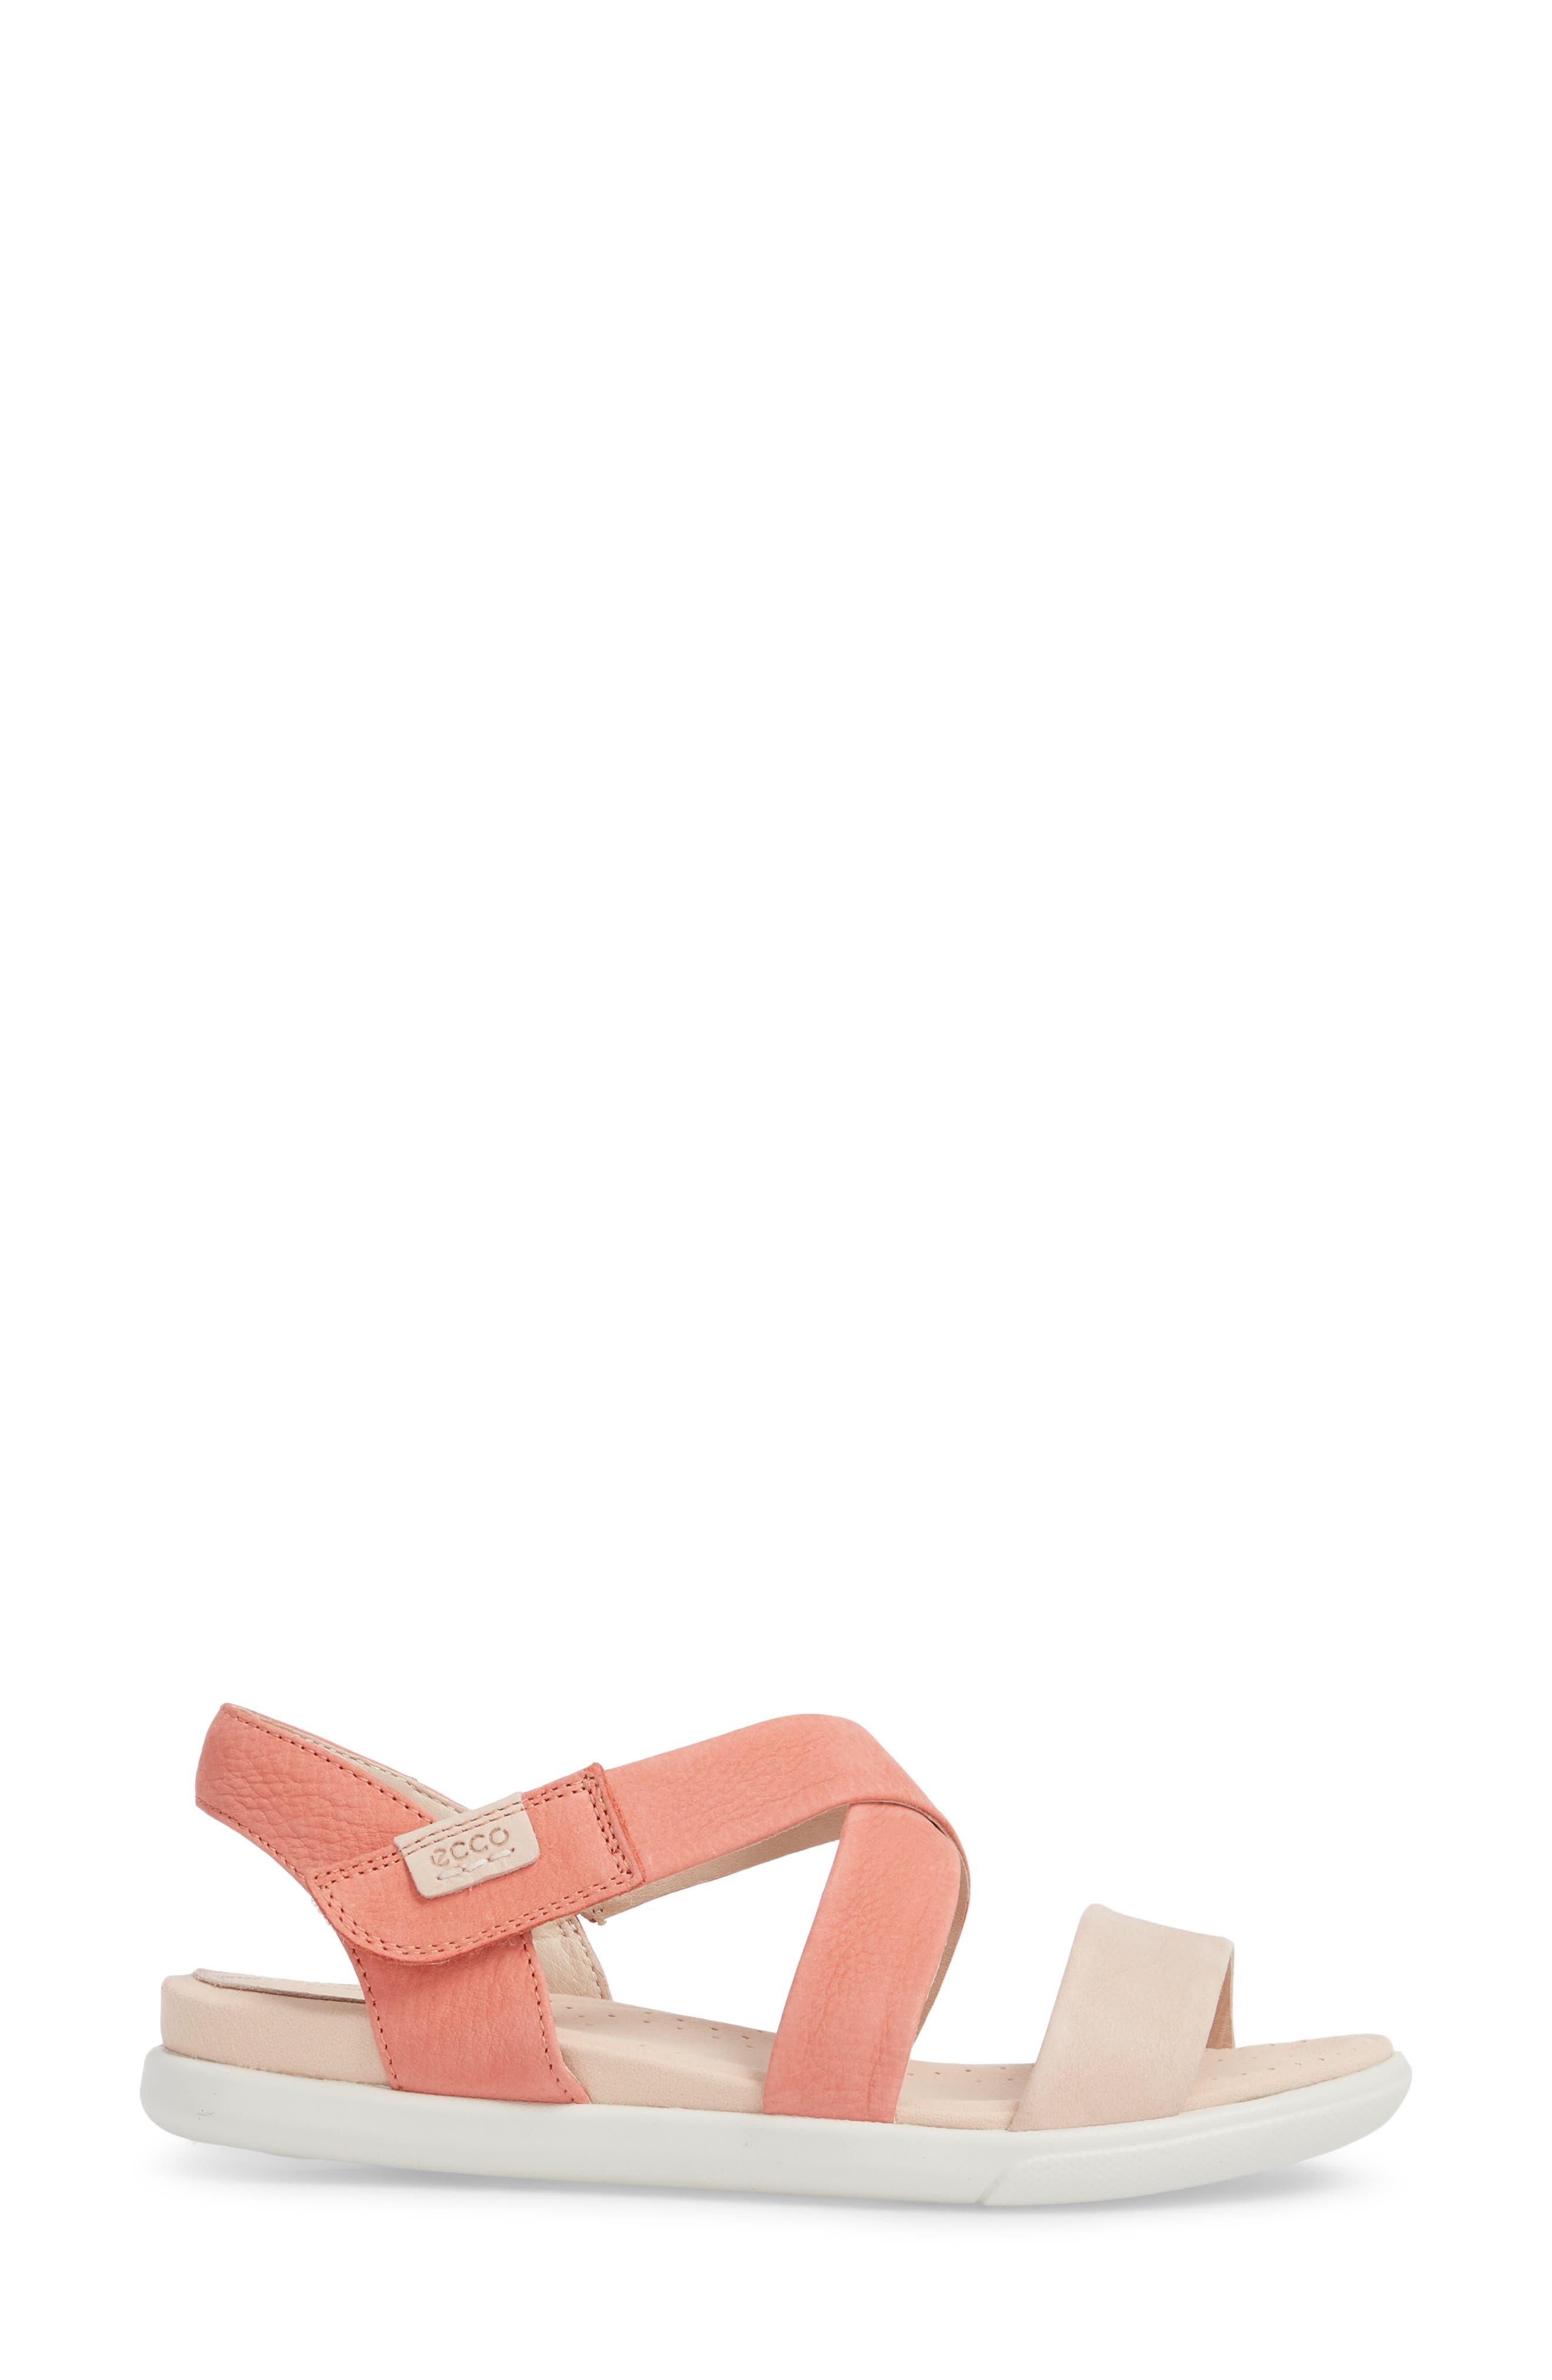 Alternate Image 3  - ECCO Damara Cross-Strap Sandal (Women)